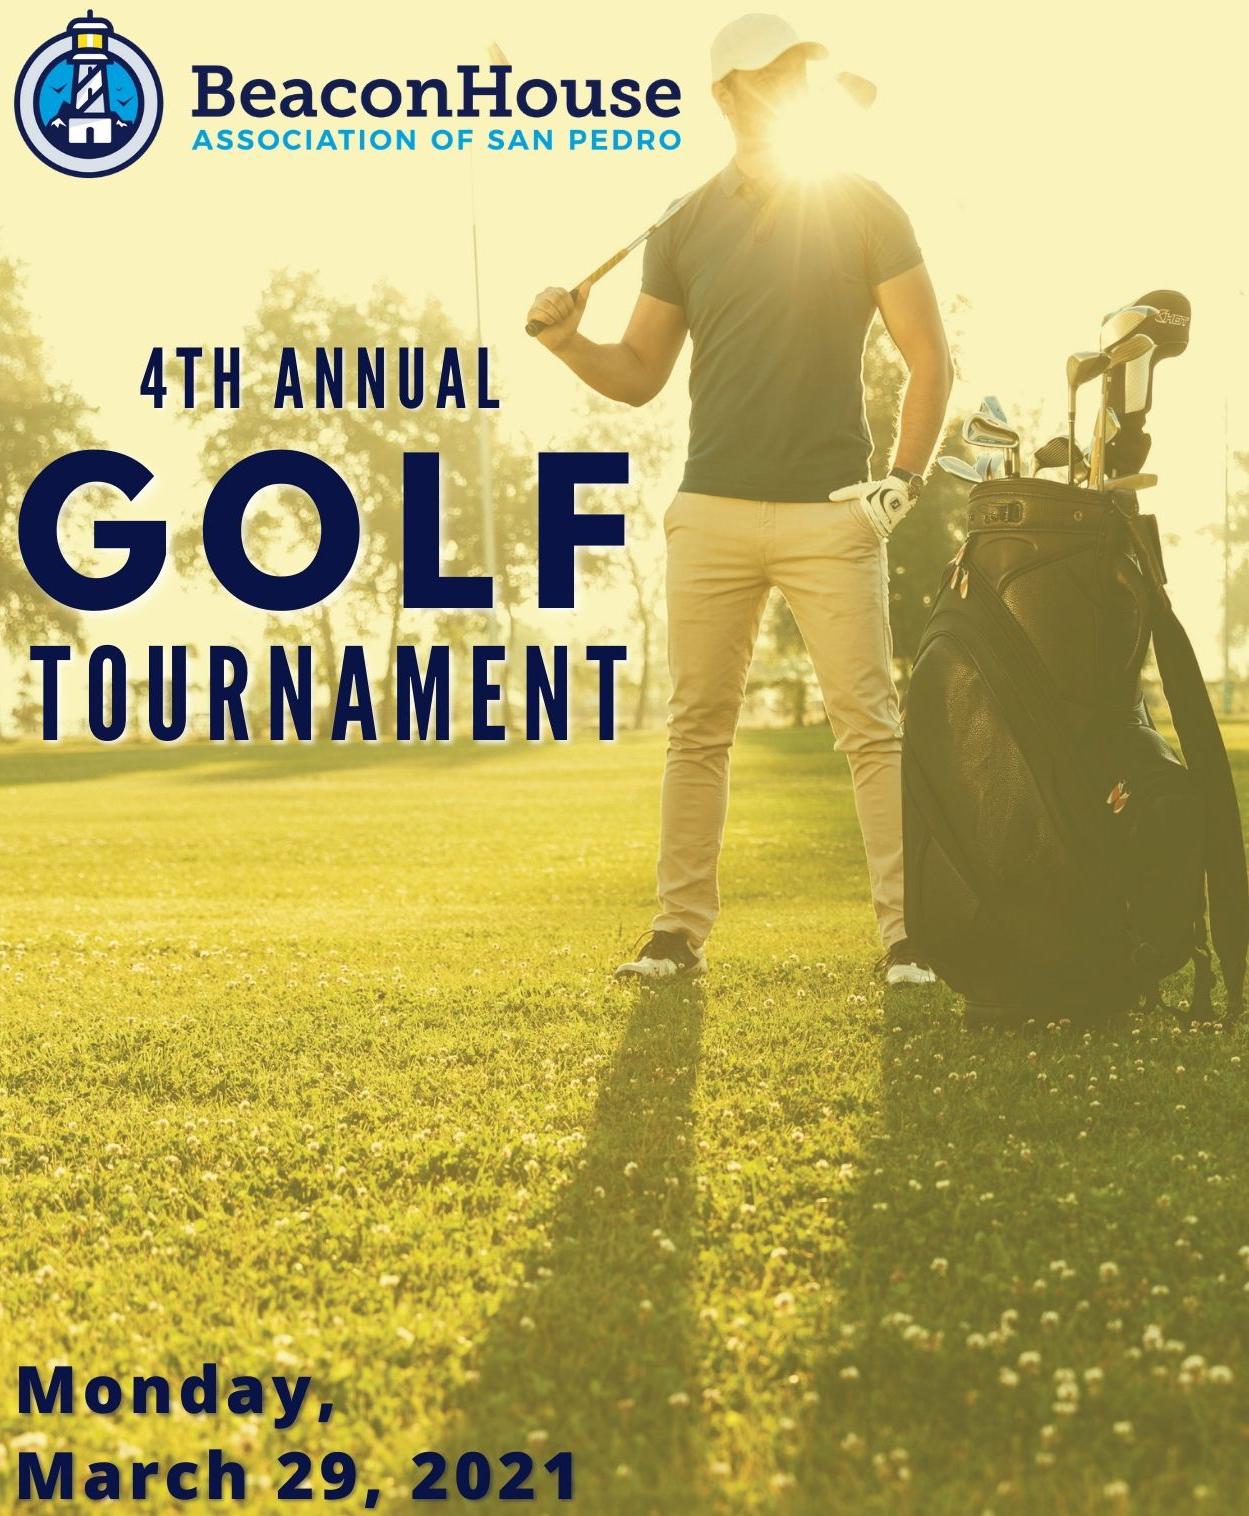 2021 Beacon House Golf Tournament image